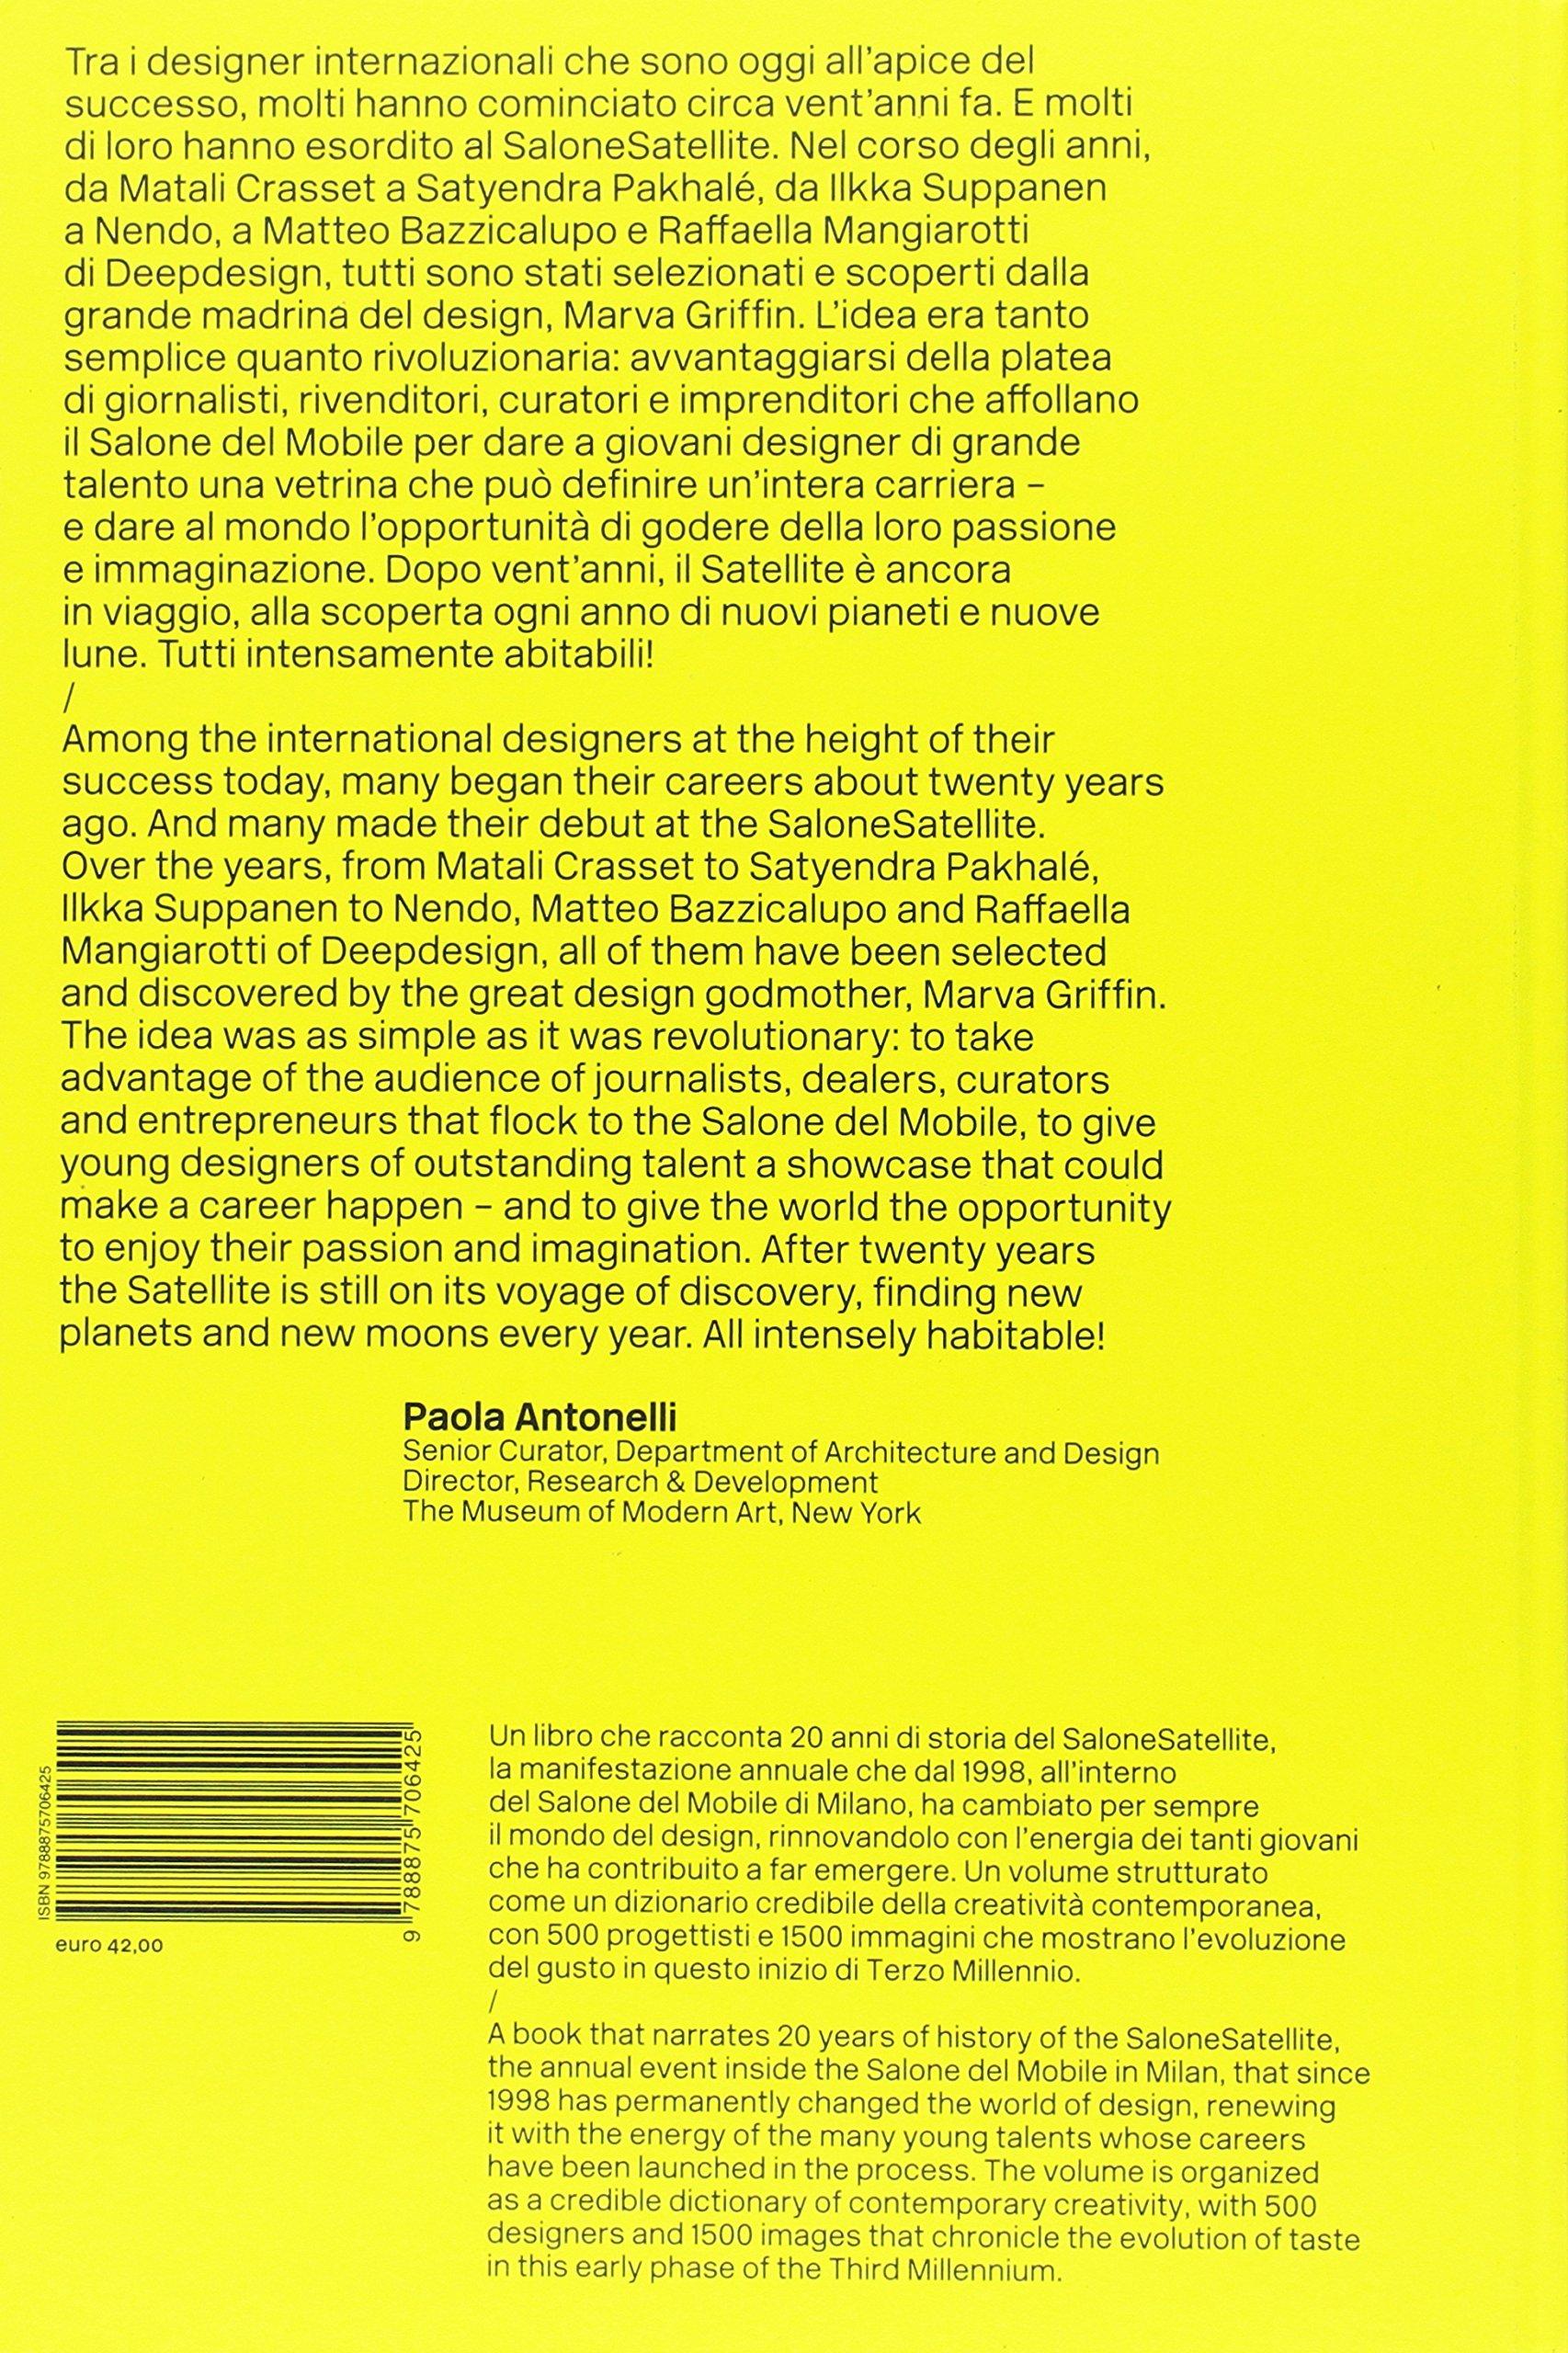 contraportada Libro SaloneSatellite 20 años - 2017